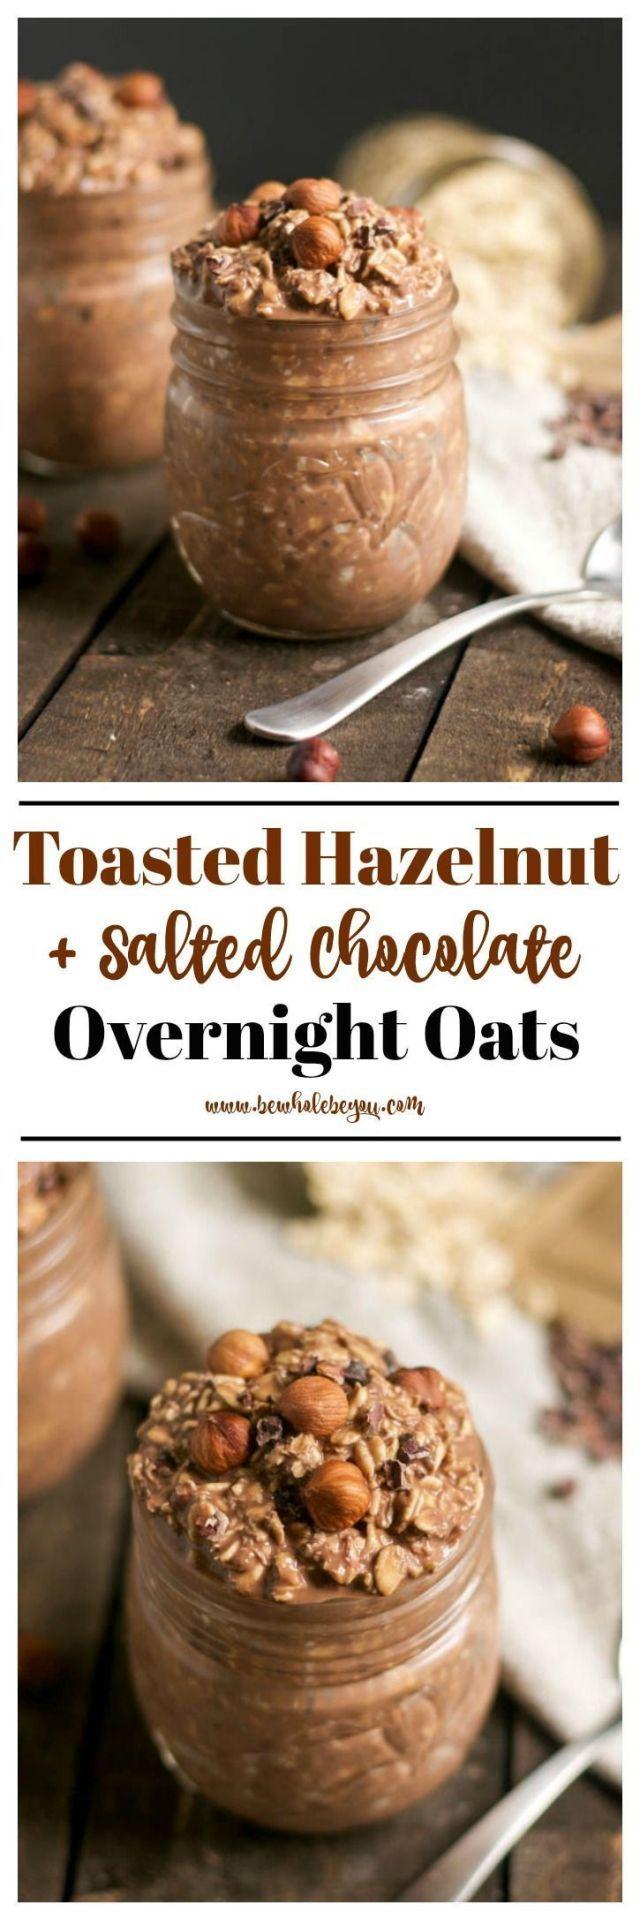 Toasted hazelnuts + oat chocolate at night,